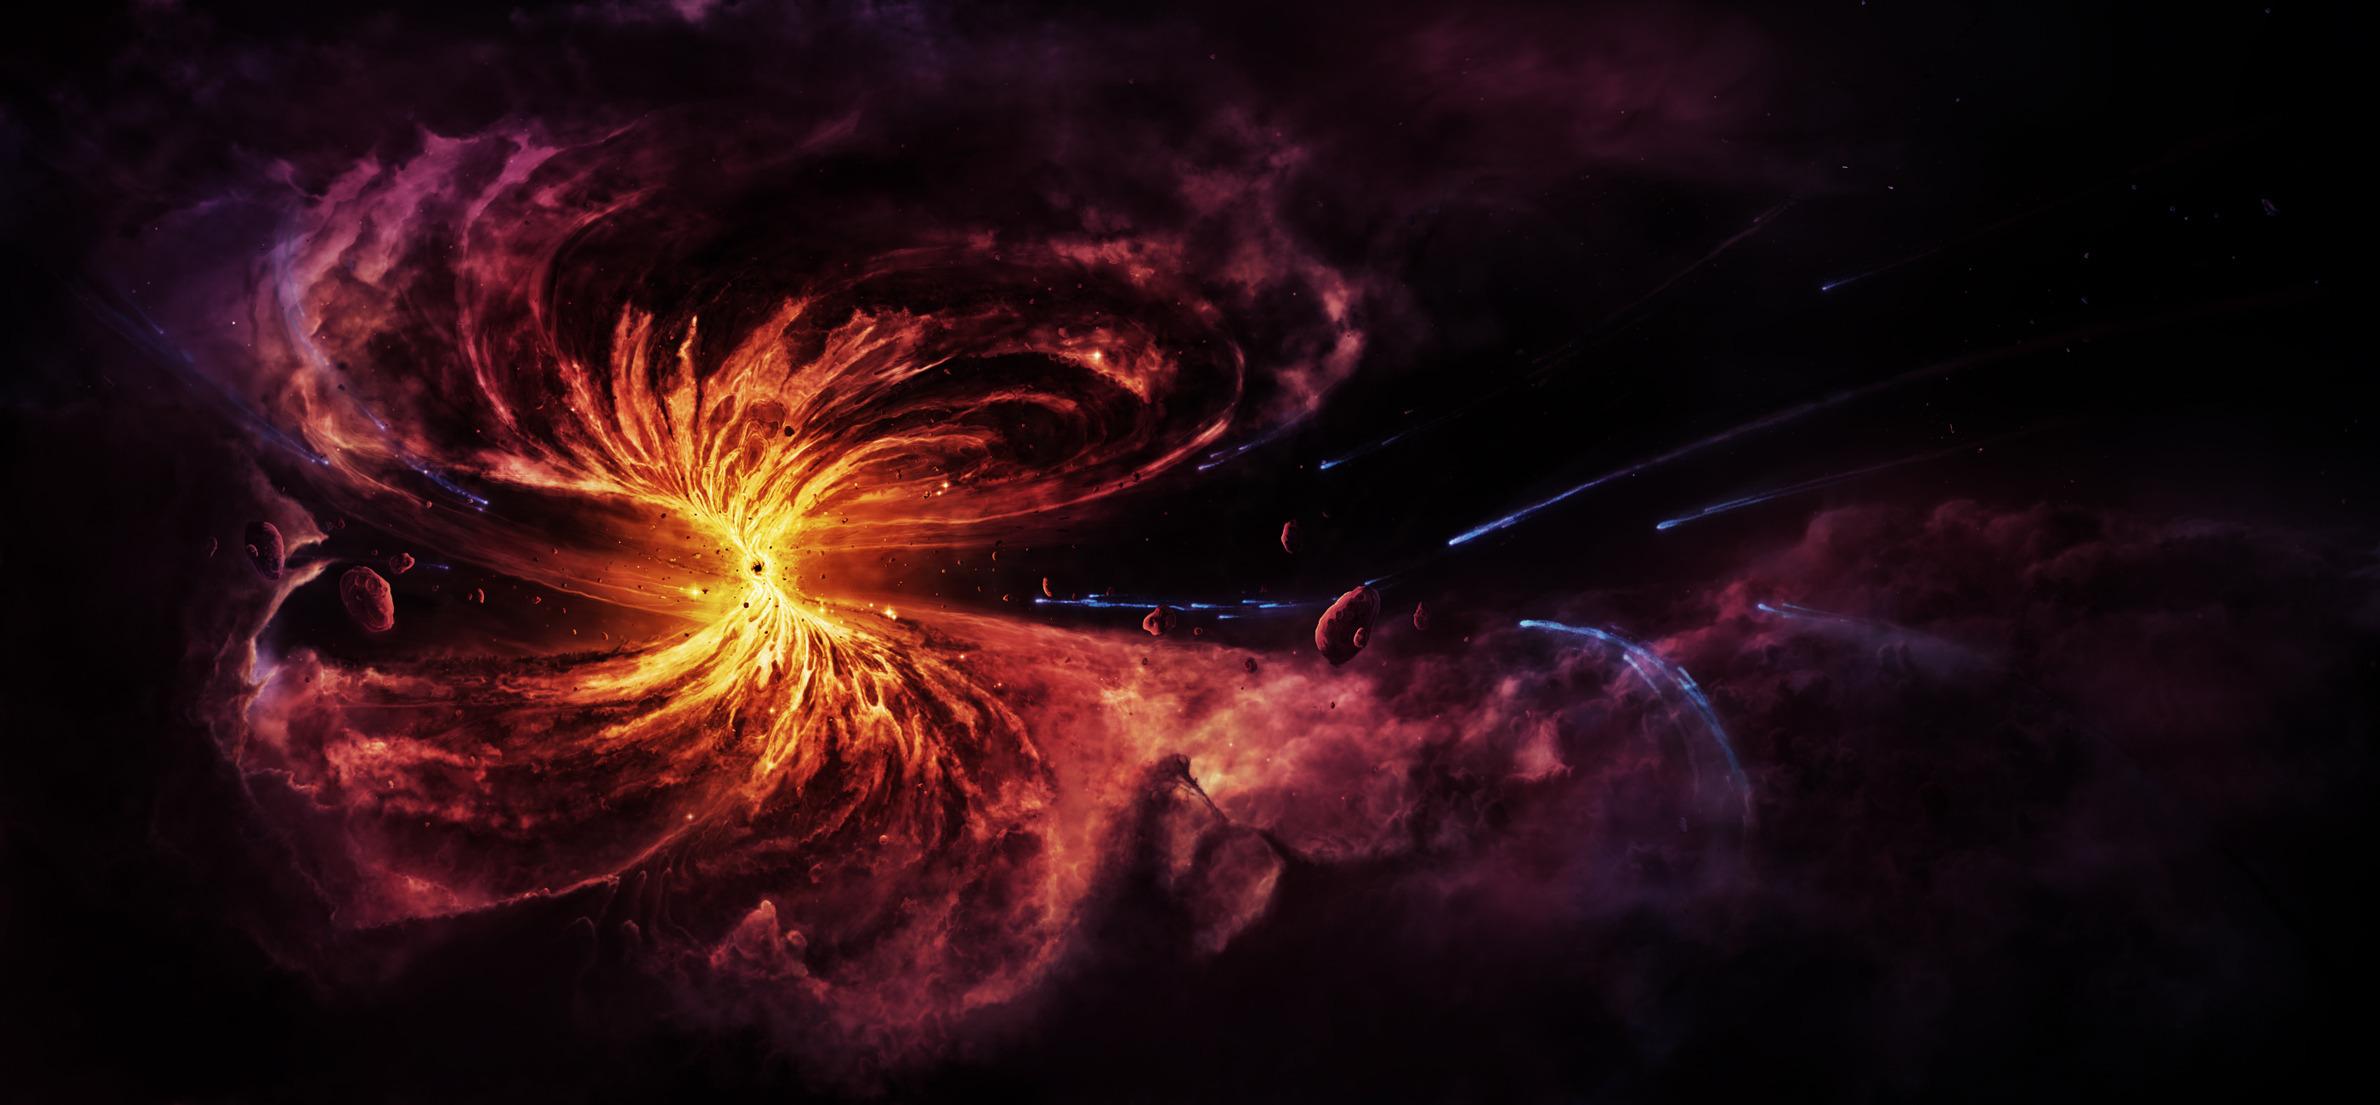 supernova element formation - HD1680×1050